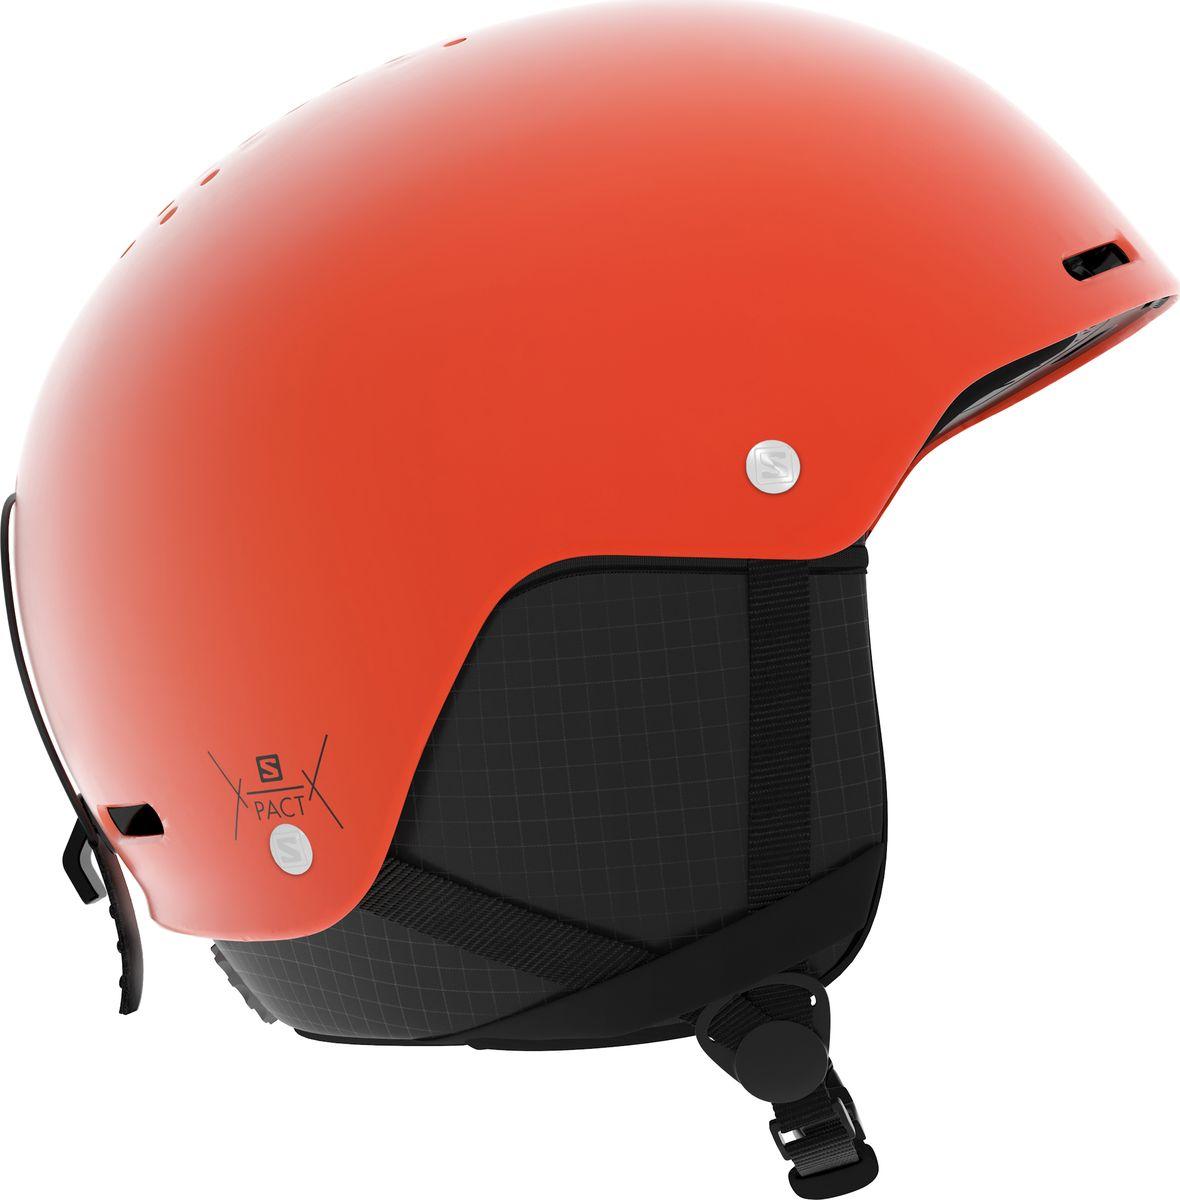 Шлем горнолыжный Salomon Pact, цвет: оранжевый. Размер S (53-56)